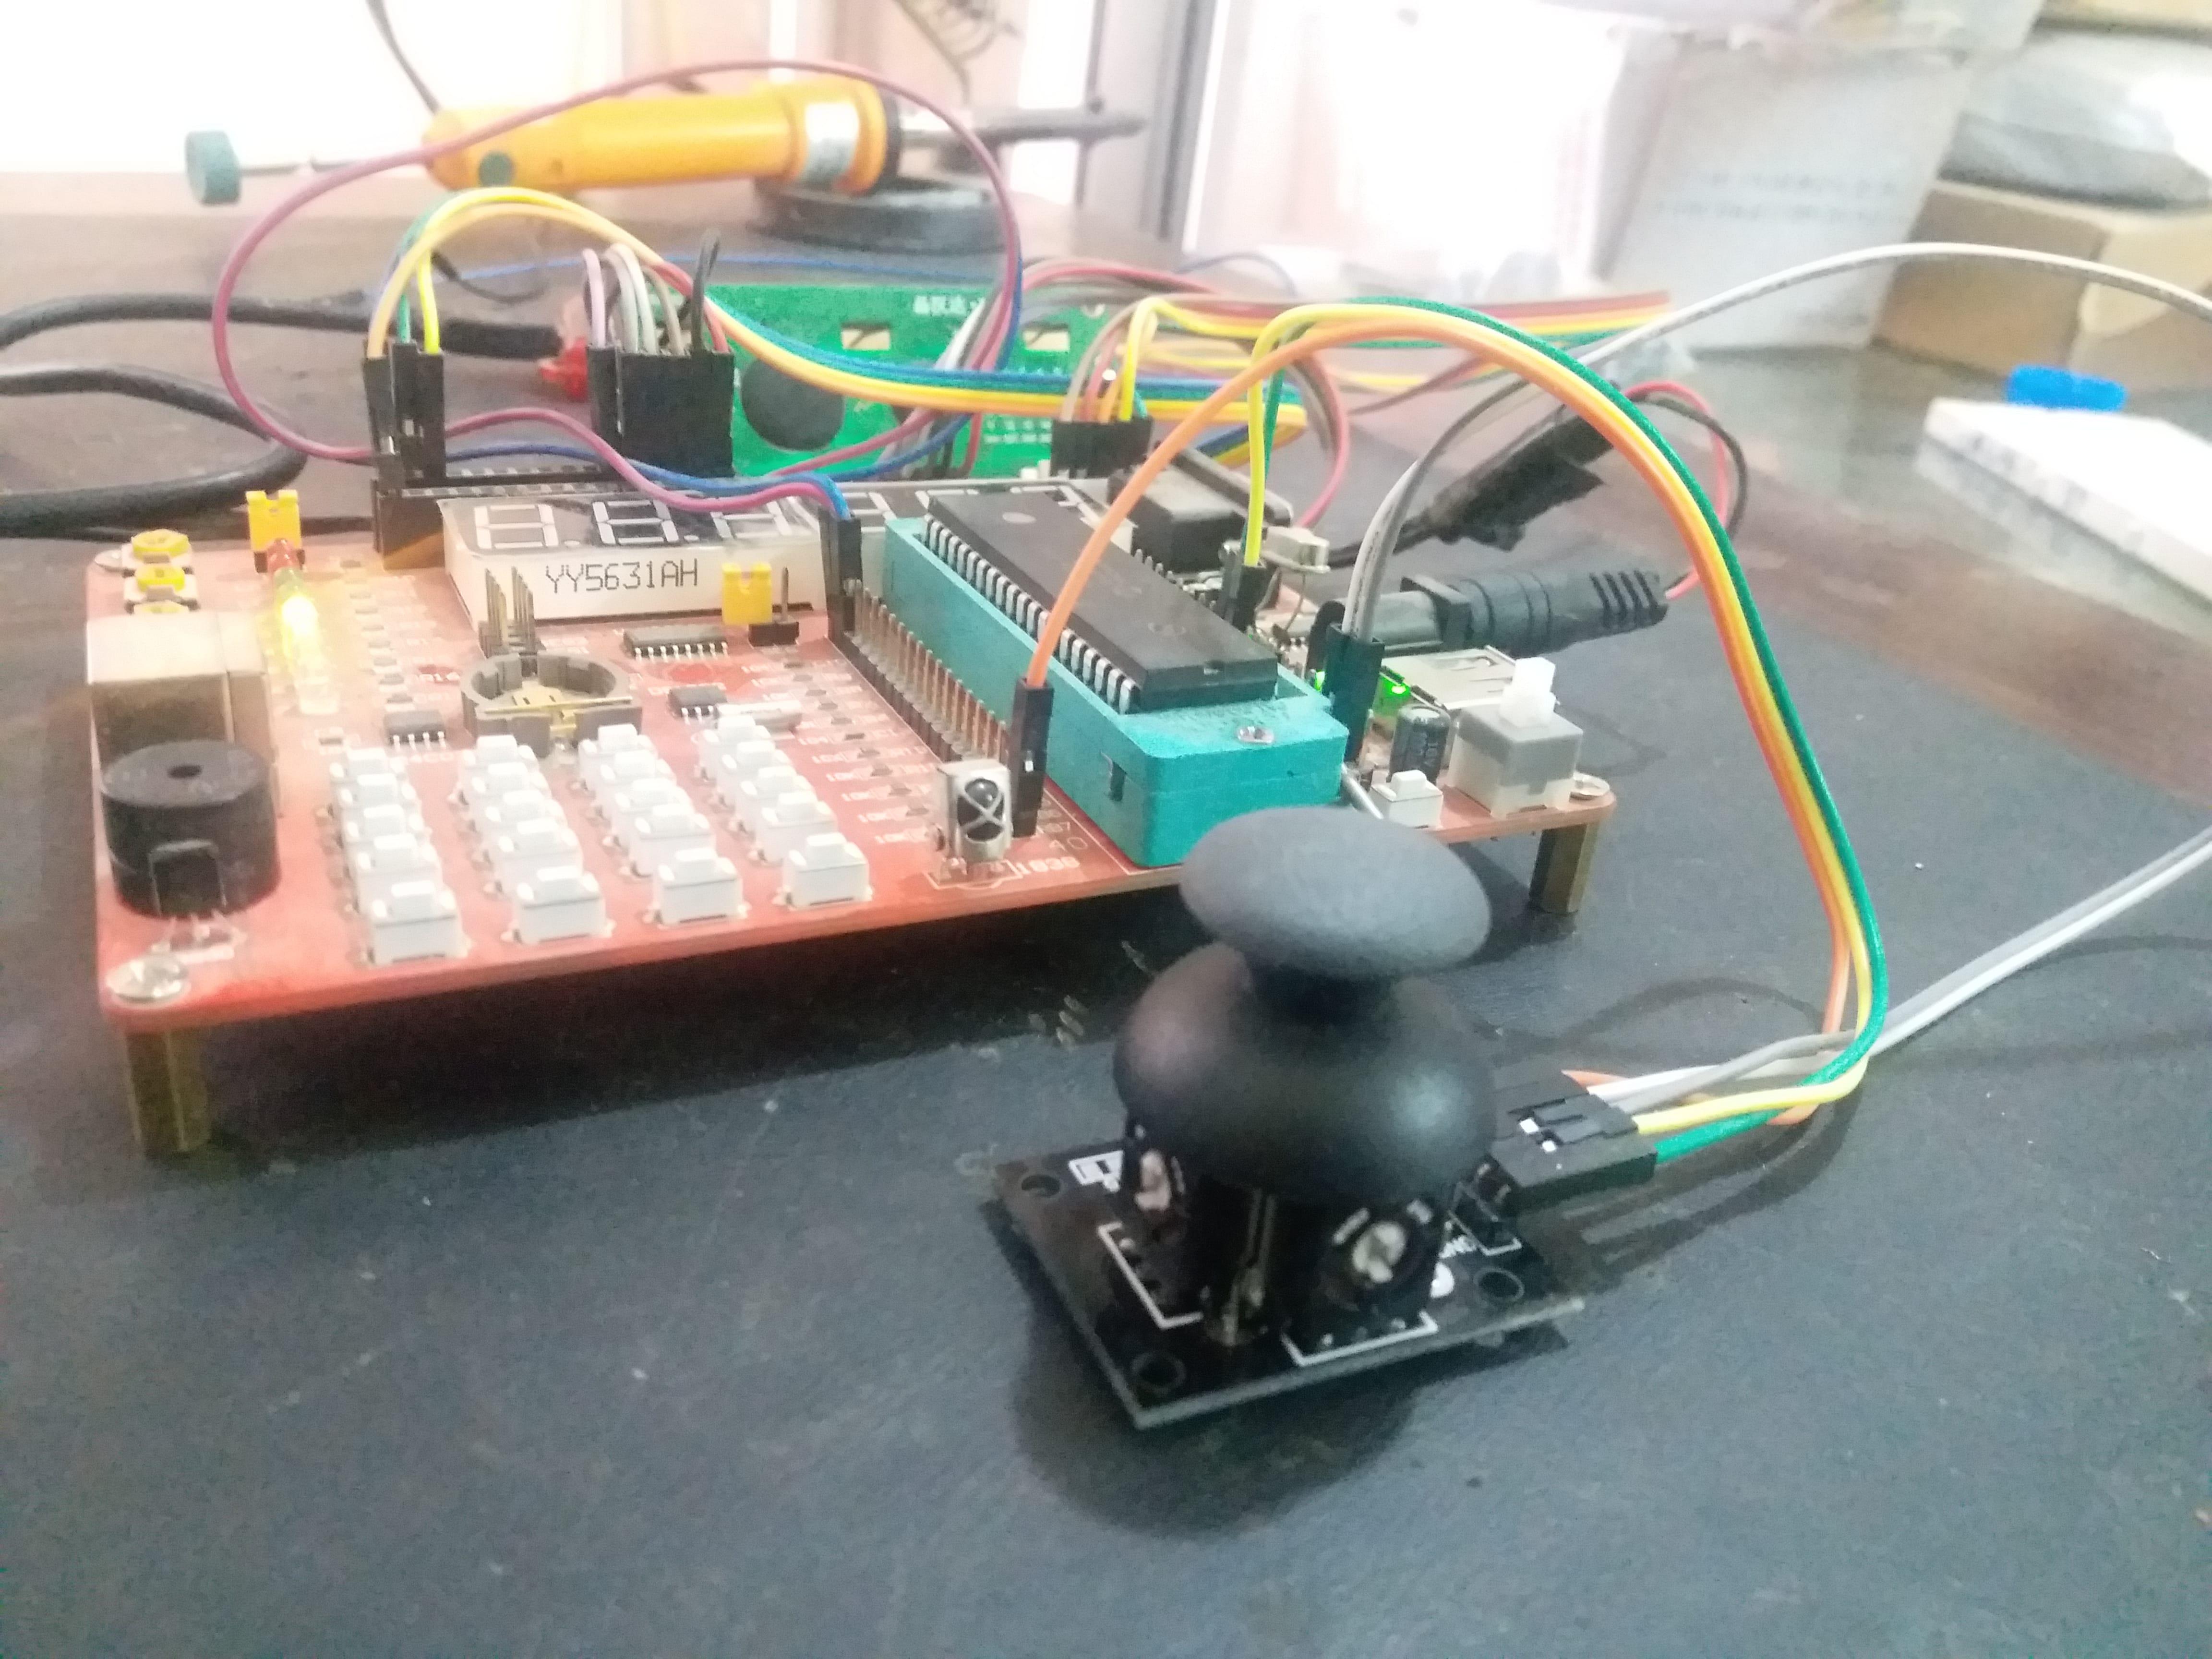 Joystick Module Interfacing With Pic Microcontroller Example Rain Detector Circuit Diagram Using 8051 Pic16f877a